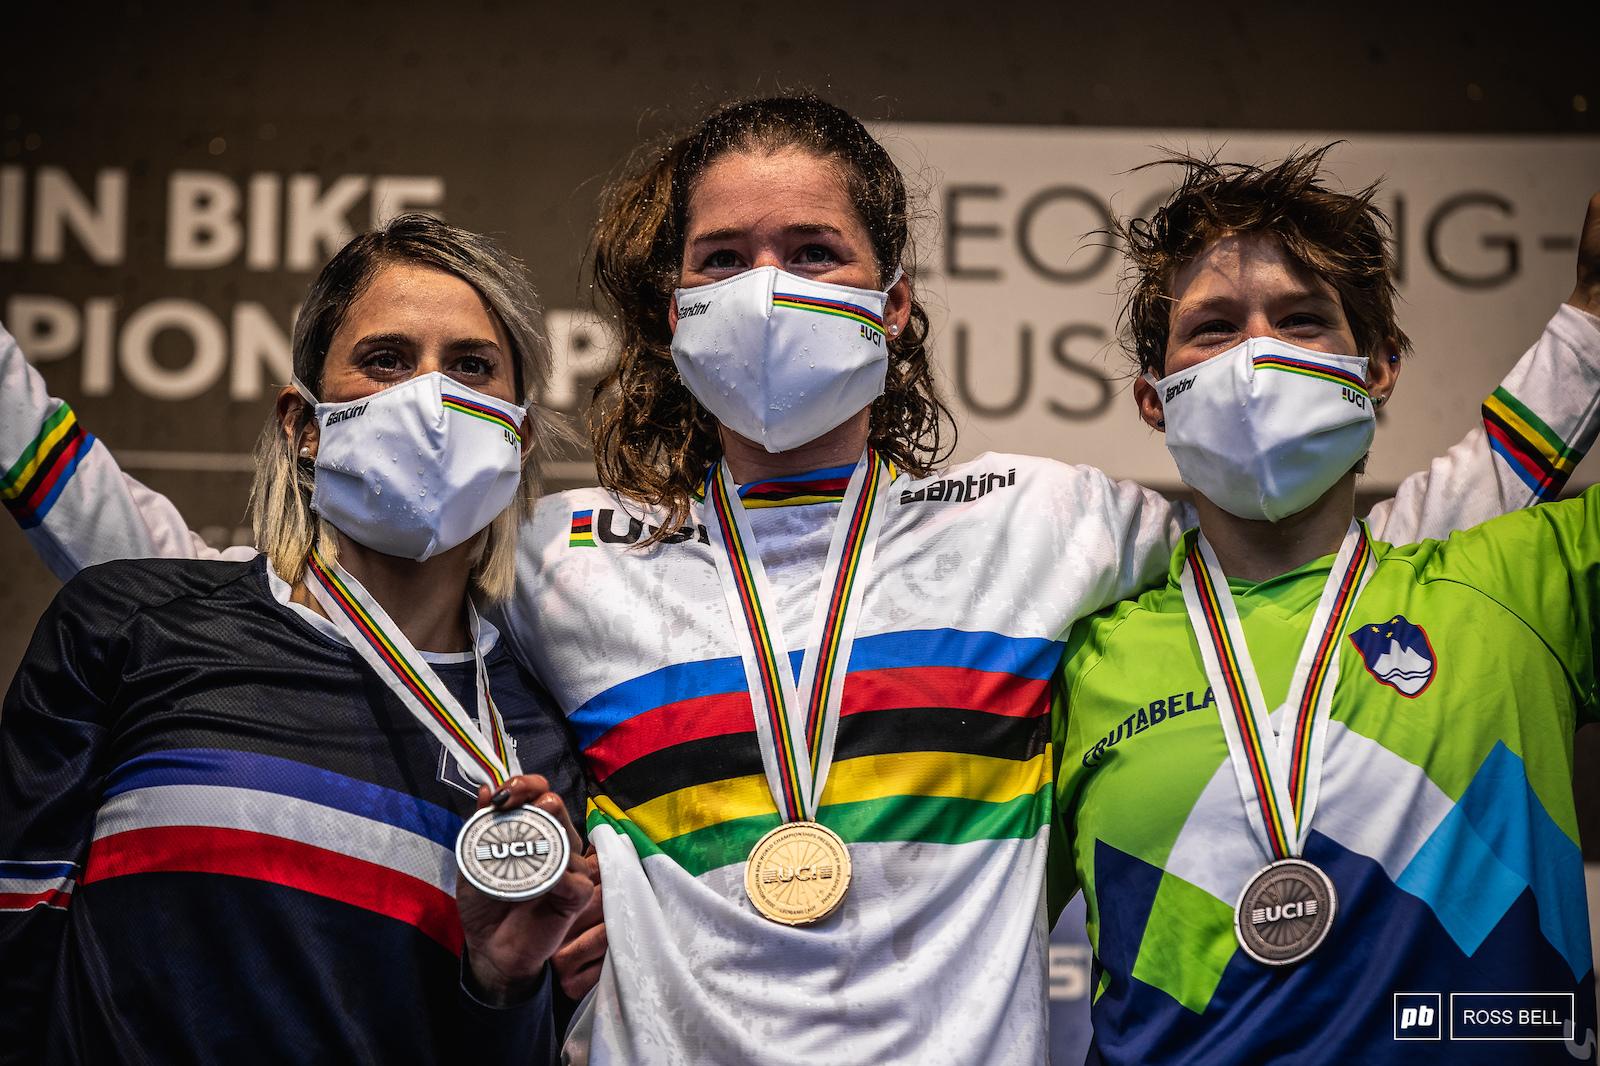 Your top 3 women. 1st Camille Balanche 2nd Myriam Nicole 3rd Monika Hrastnik.